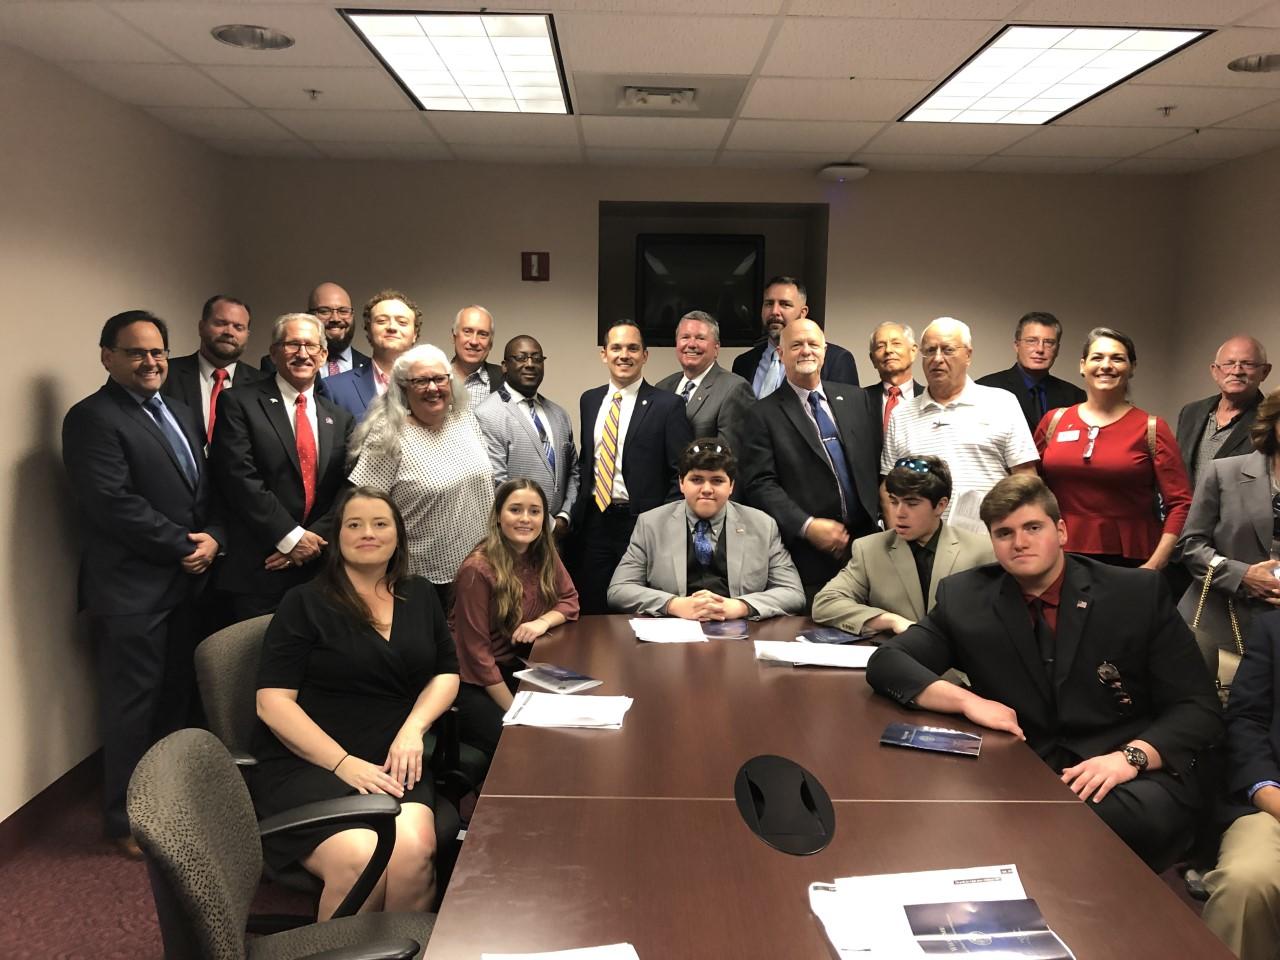 RLC of Florida 2019 Liberty Lobby Days A Tremendous Success!